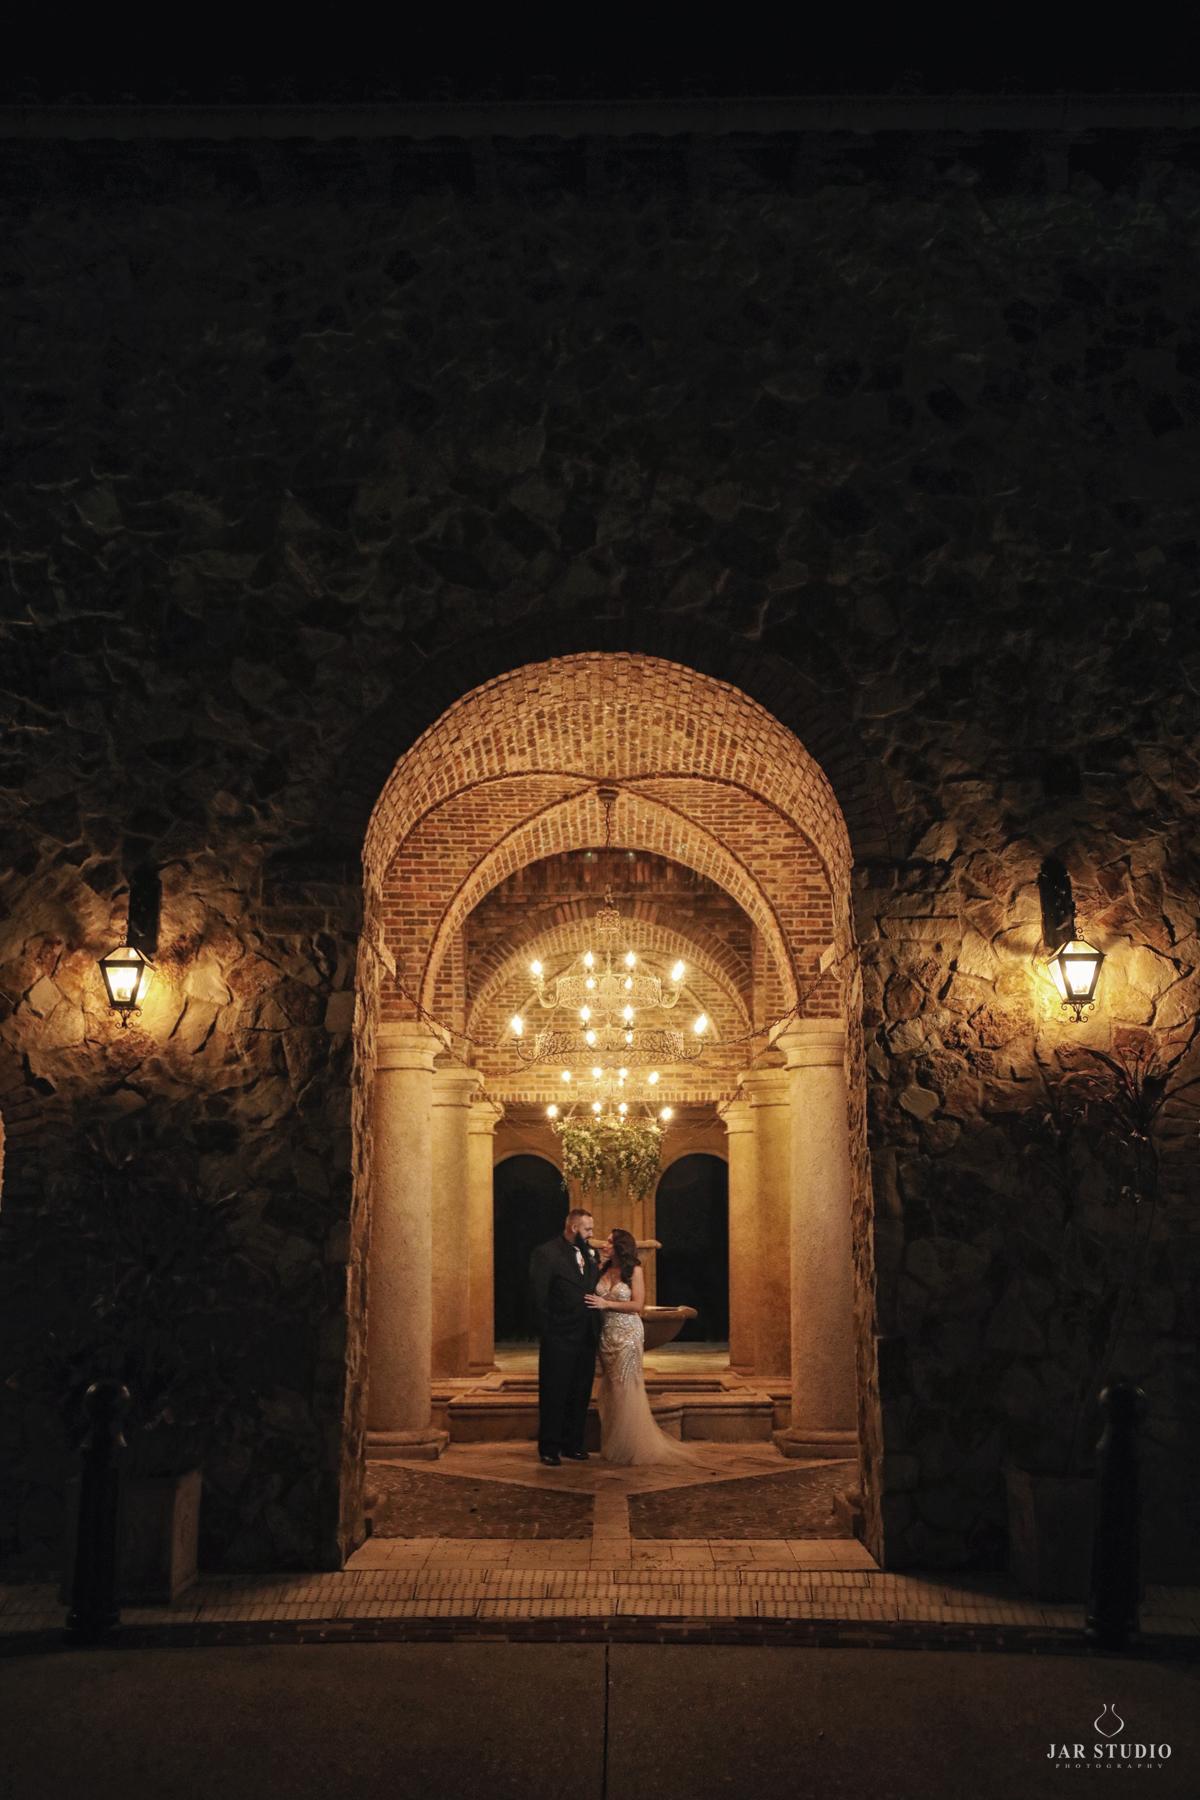 43-bella-collina-best-place-bridal-photography-jarstudio.jpg